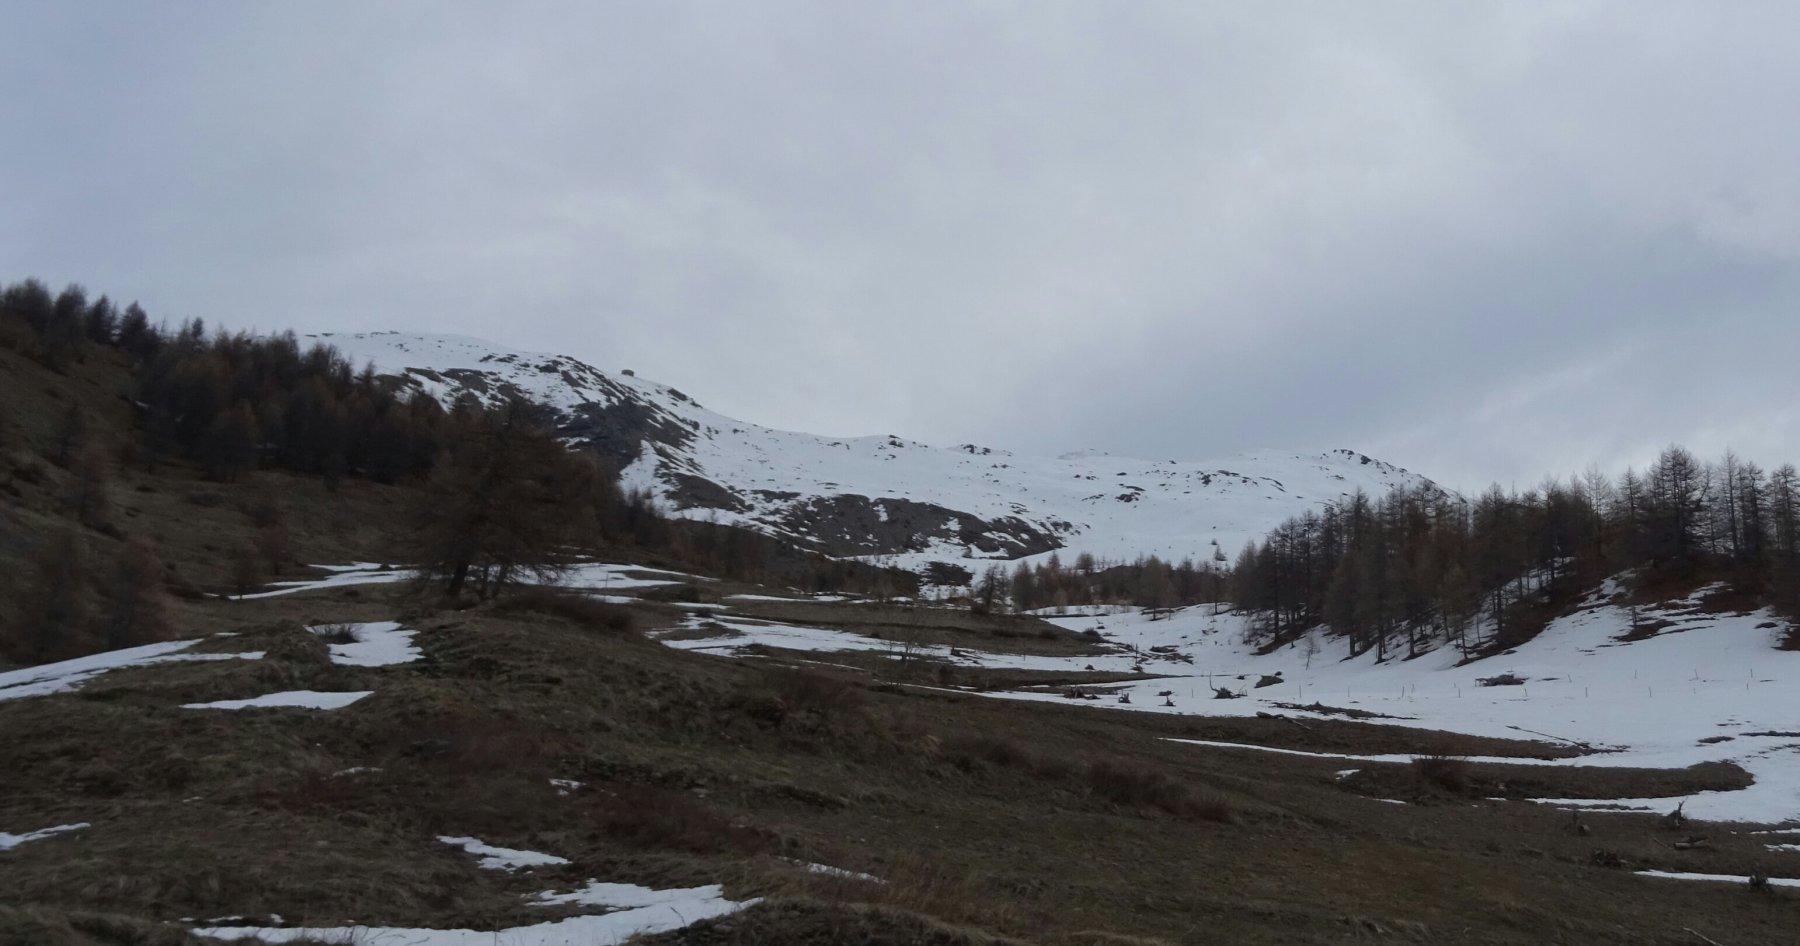 Lingue di neve a Bessen...